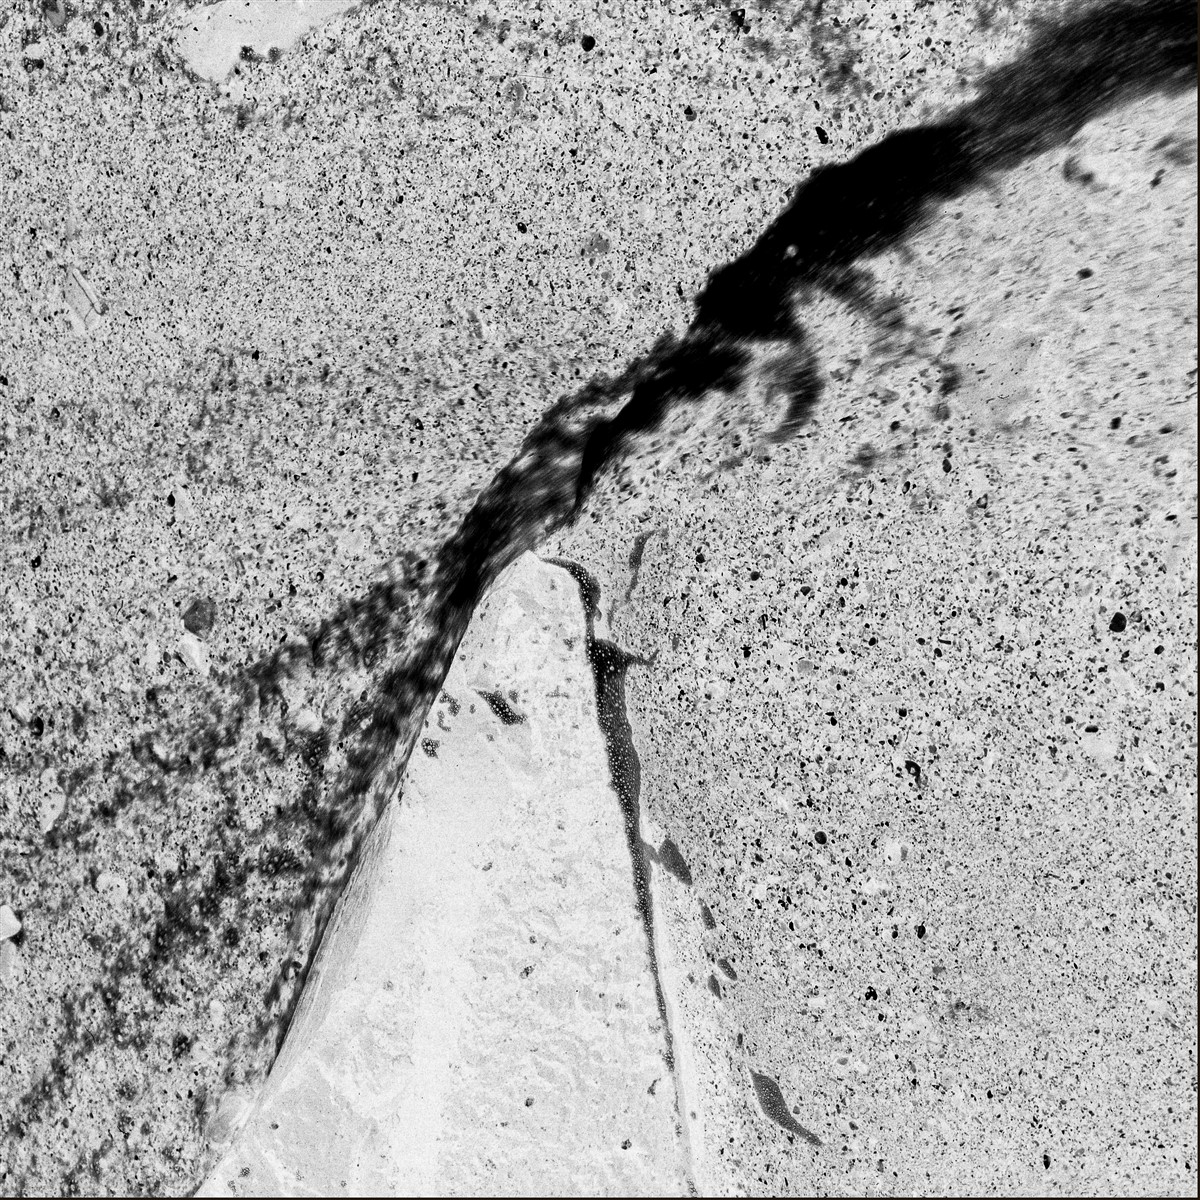 Riccardo Squillantini, Lava Flow and Rock, Martian Age series